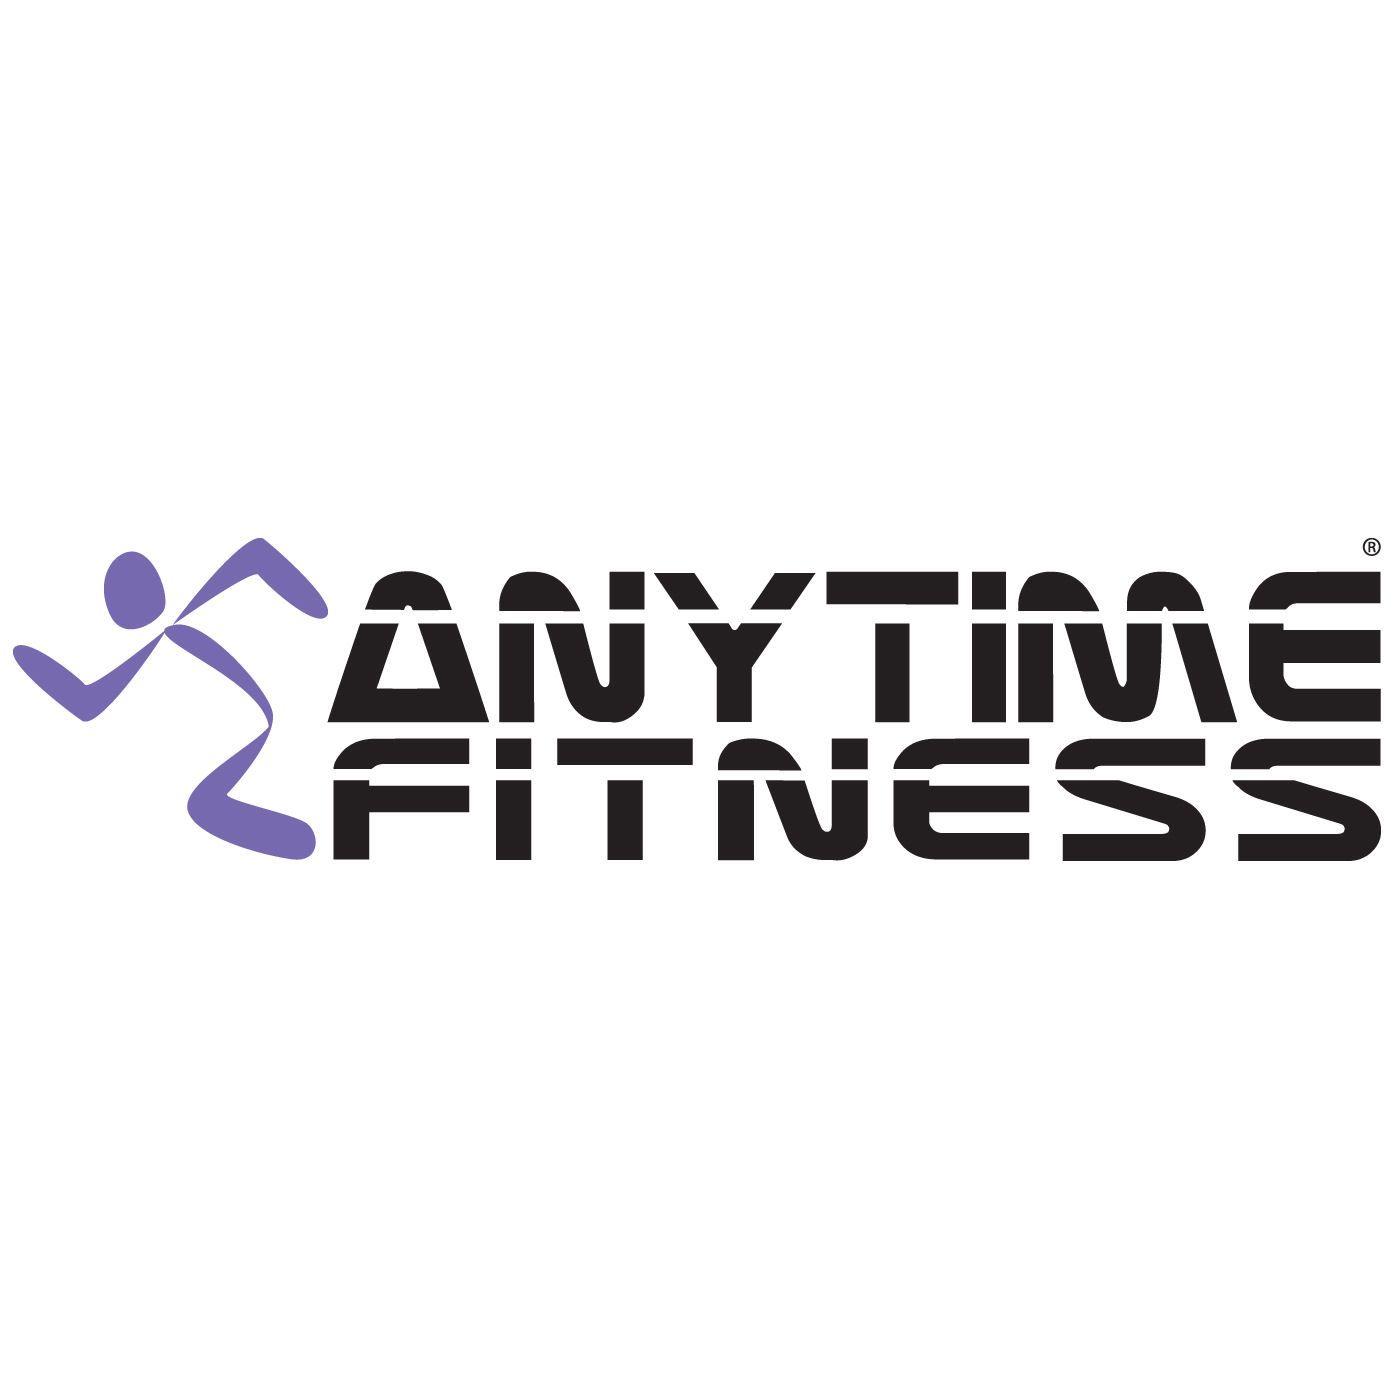 anytimefitness logo fitness exercise club pany